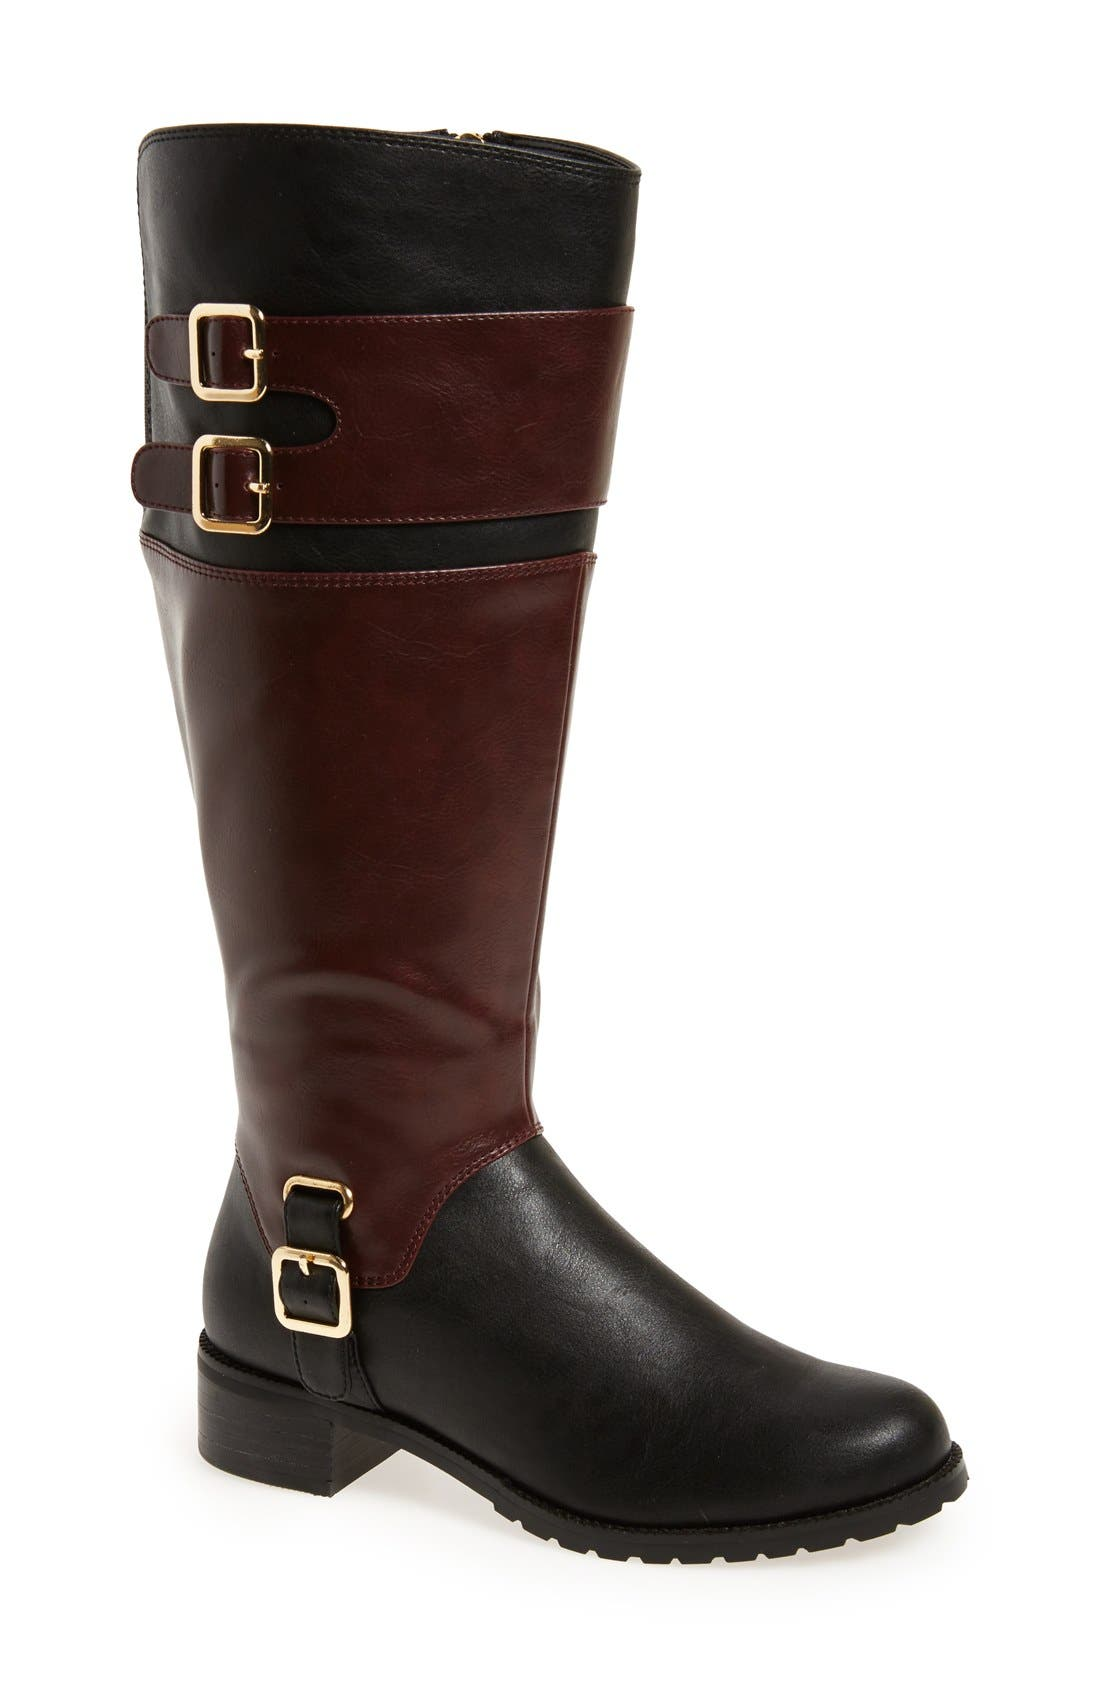 Alternate Image 1 Selected - Bella Vita 'Adriann II' Knee High Boot (Women) (Wide Calf)